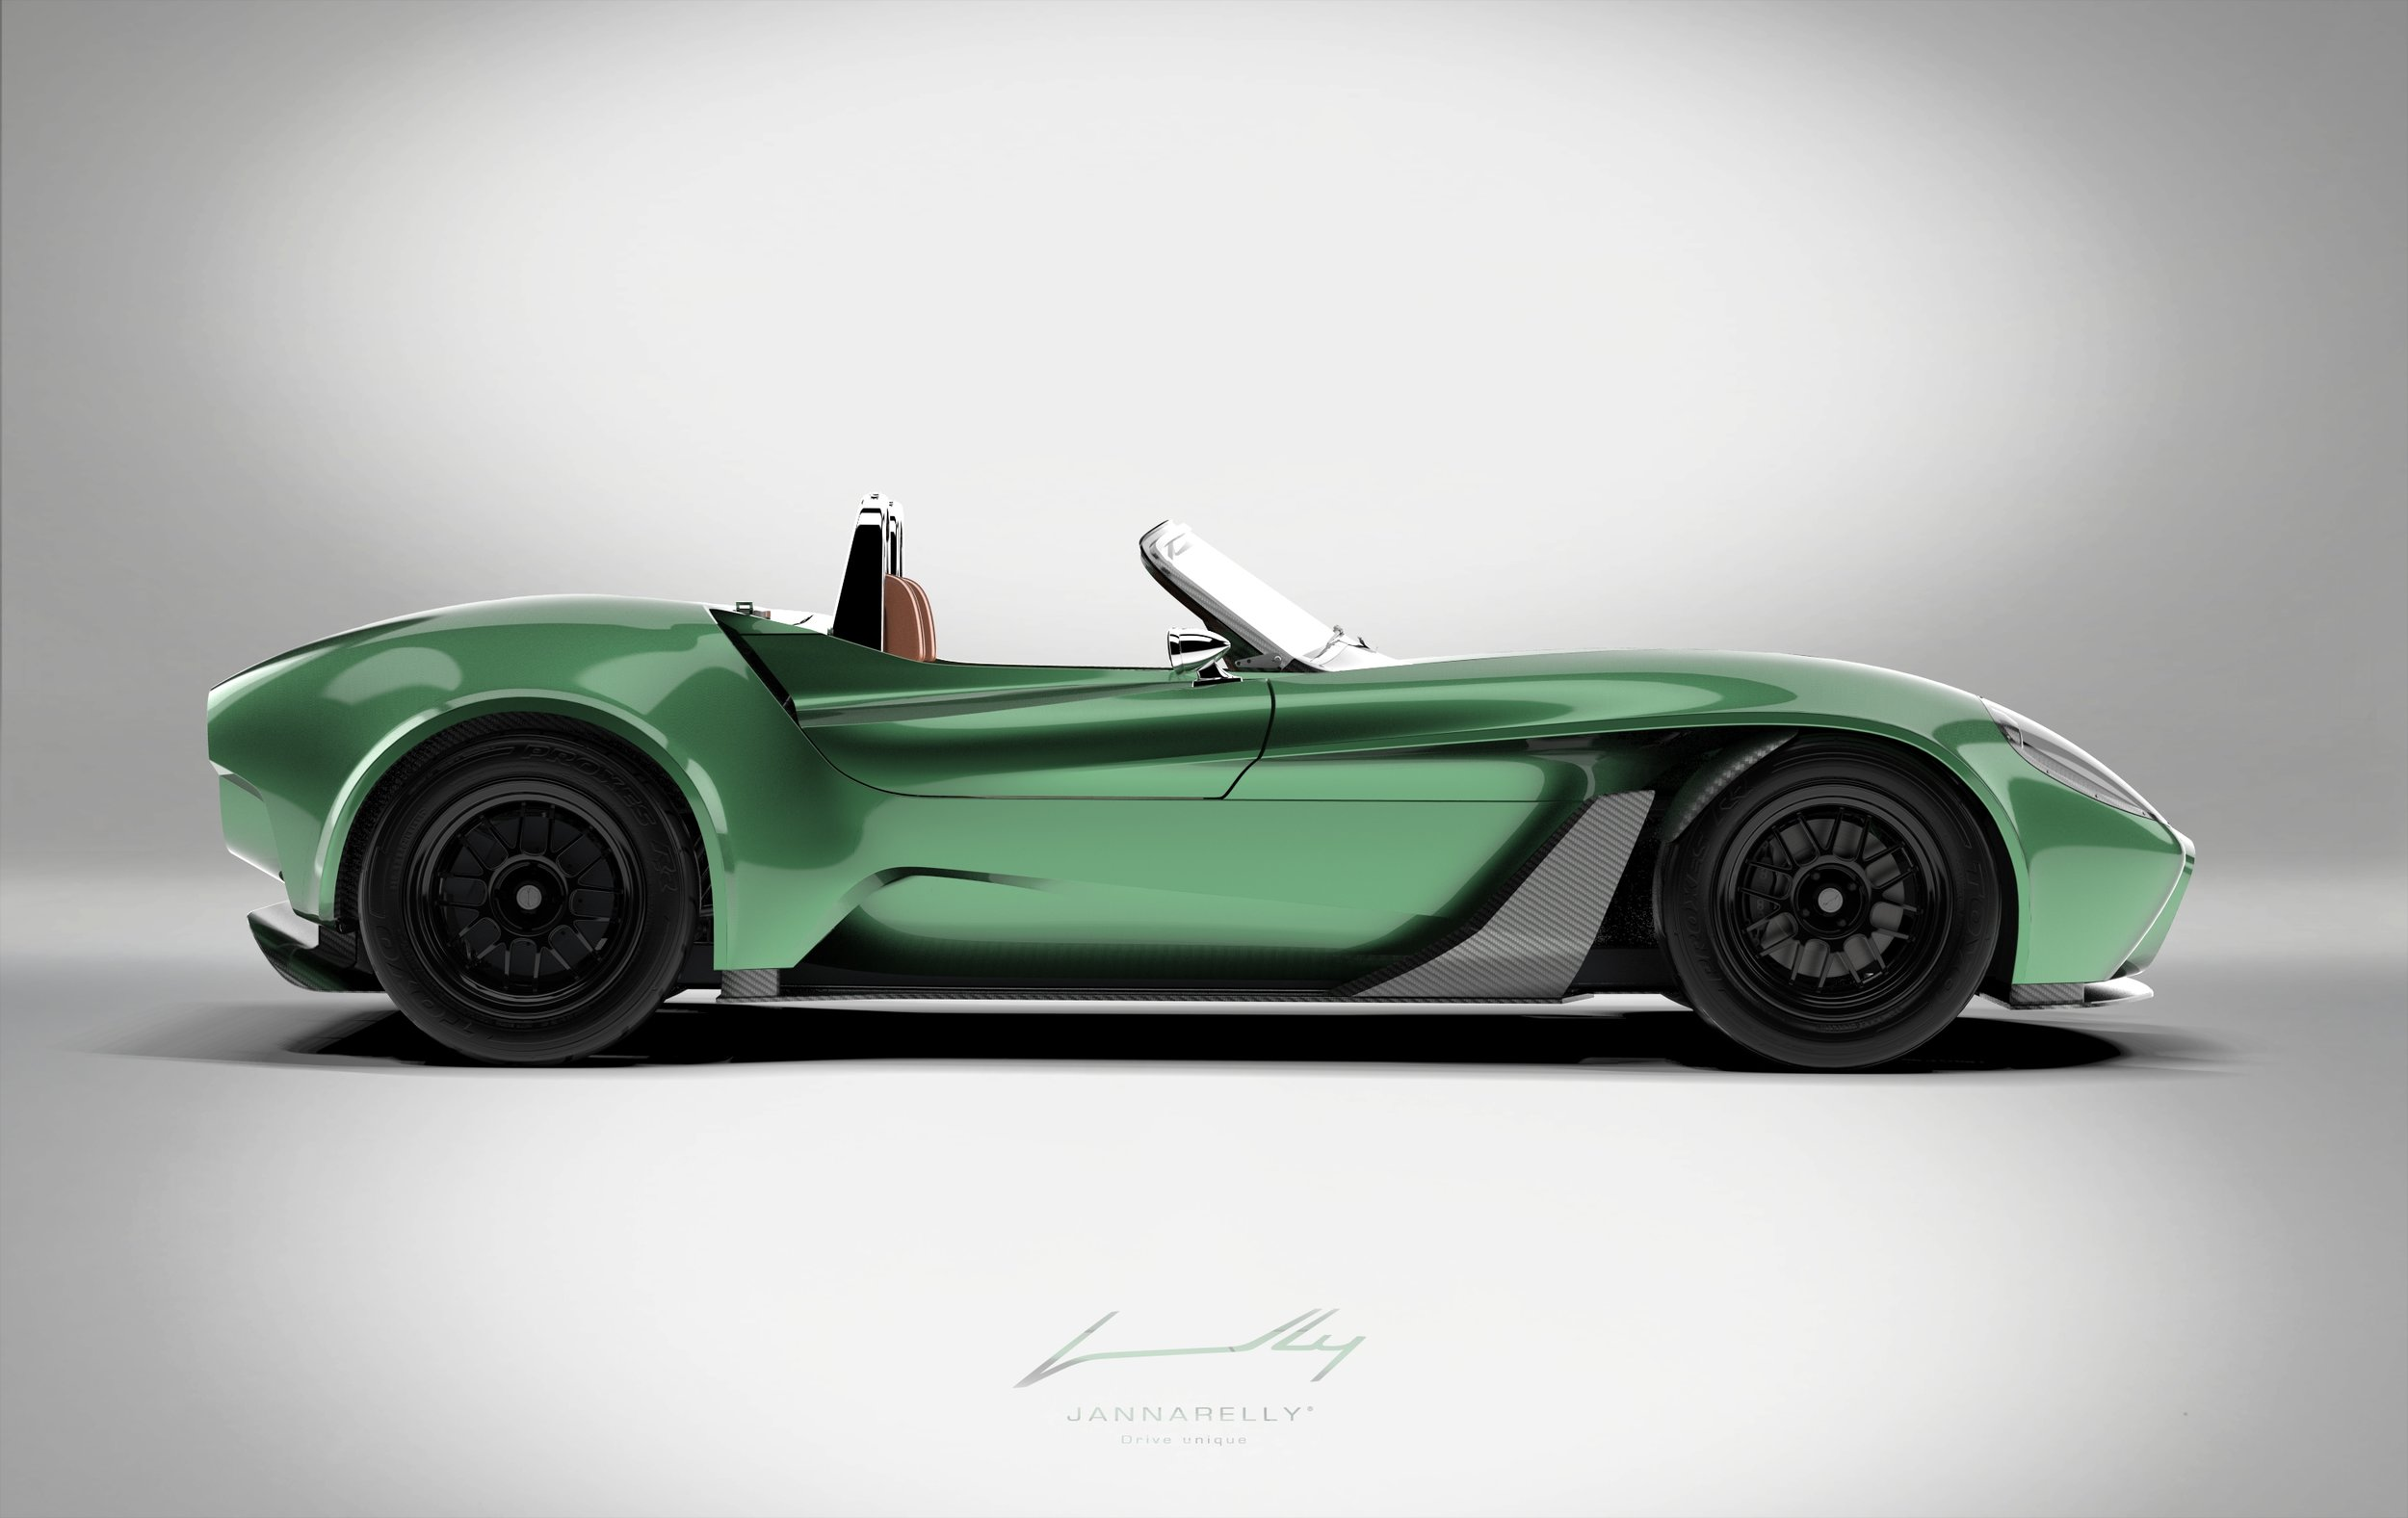 J design1 roadster.330.jpg